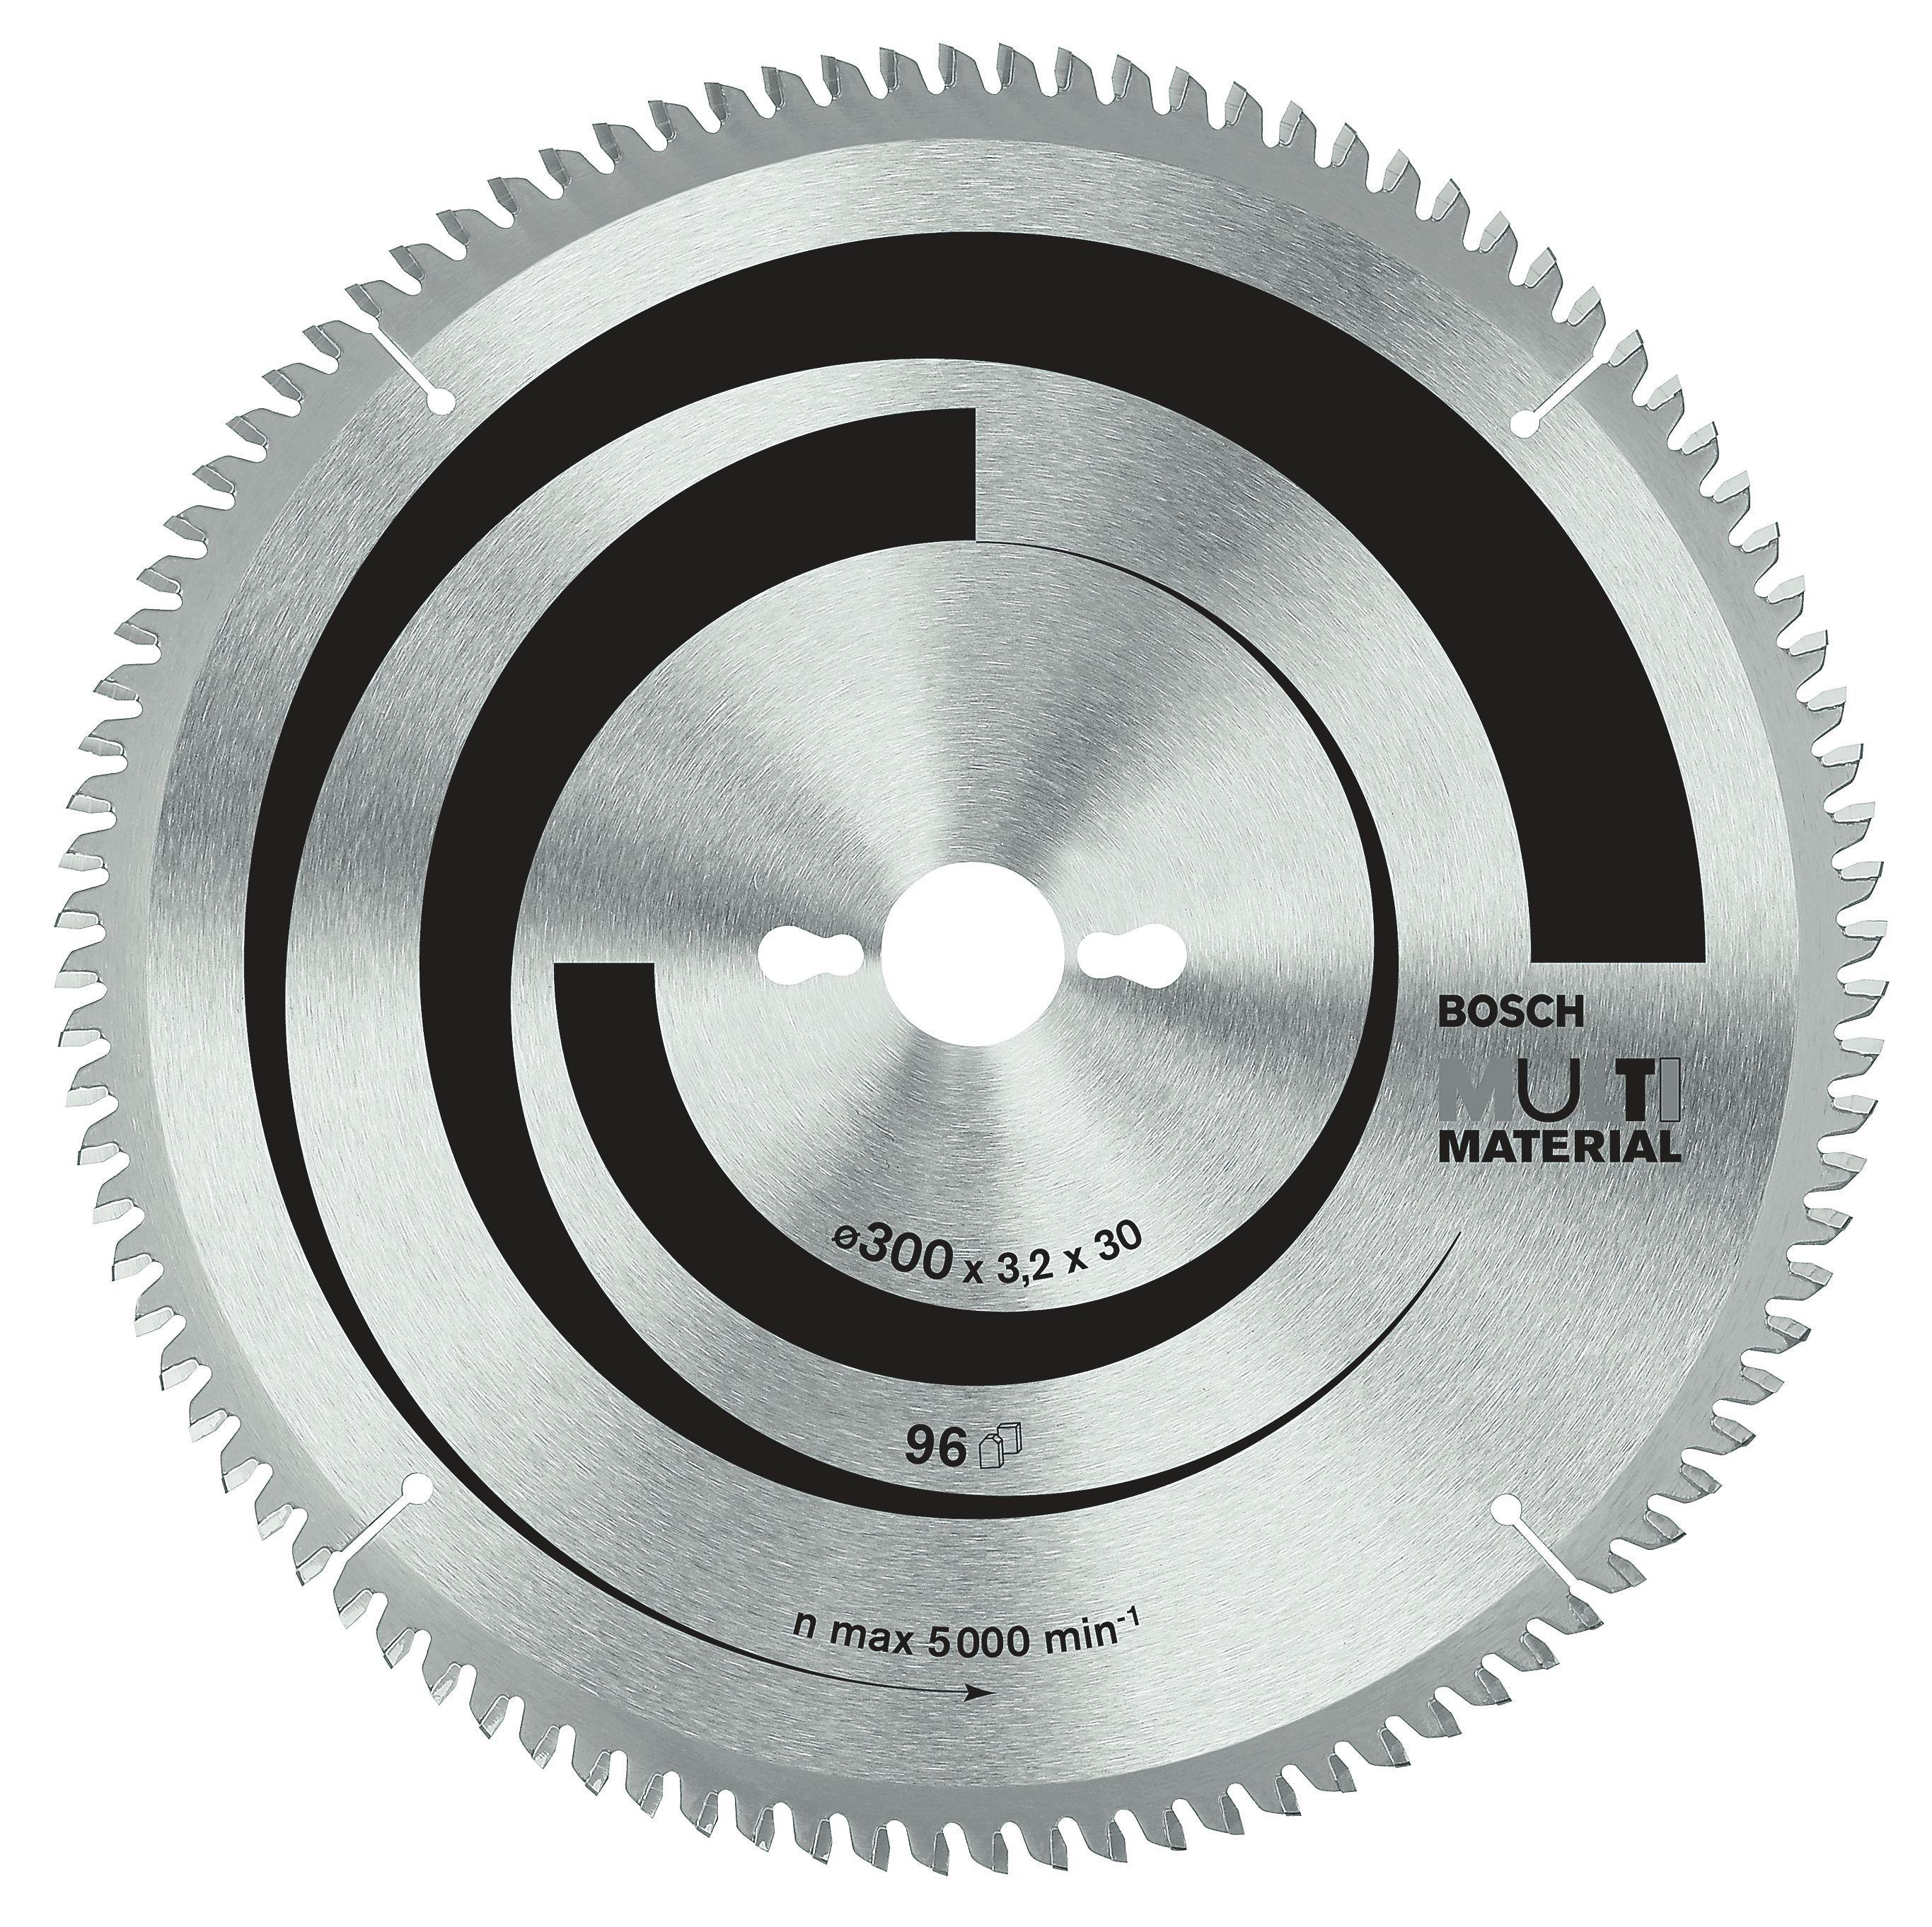 Bosch 80t Circular Saw Blade (dia)216mm